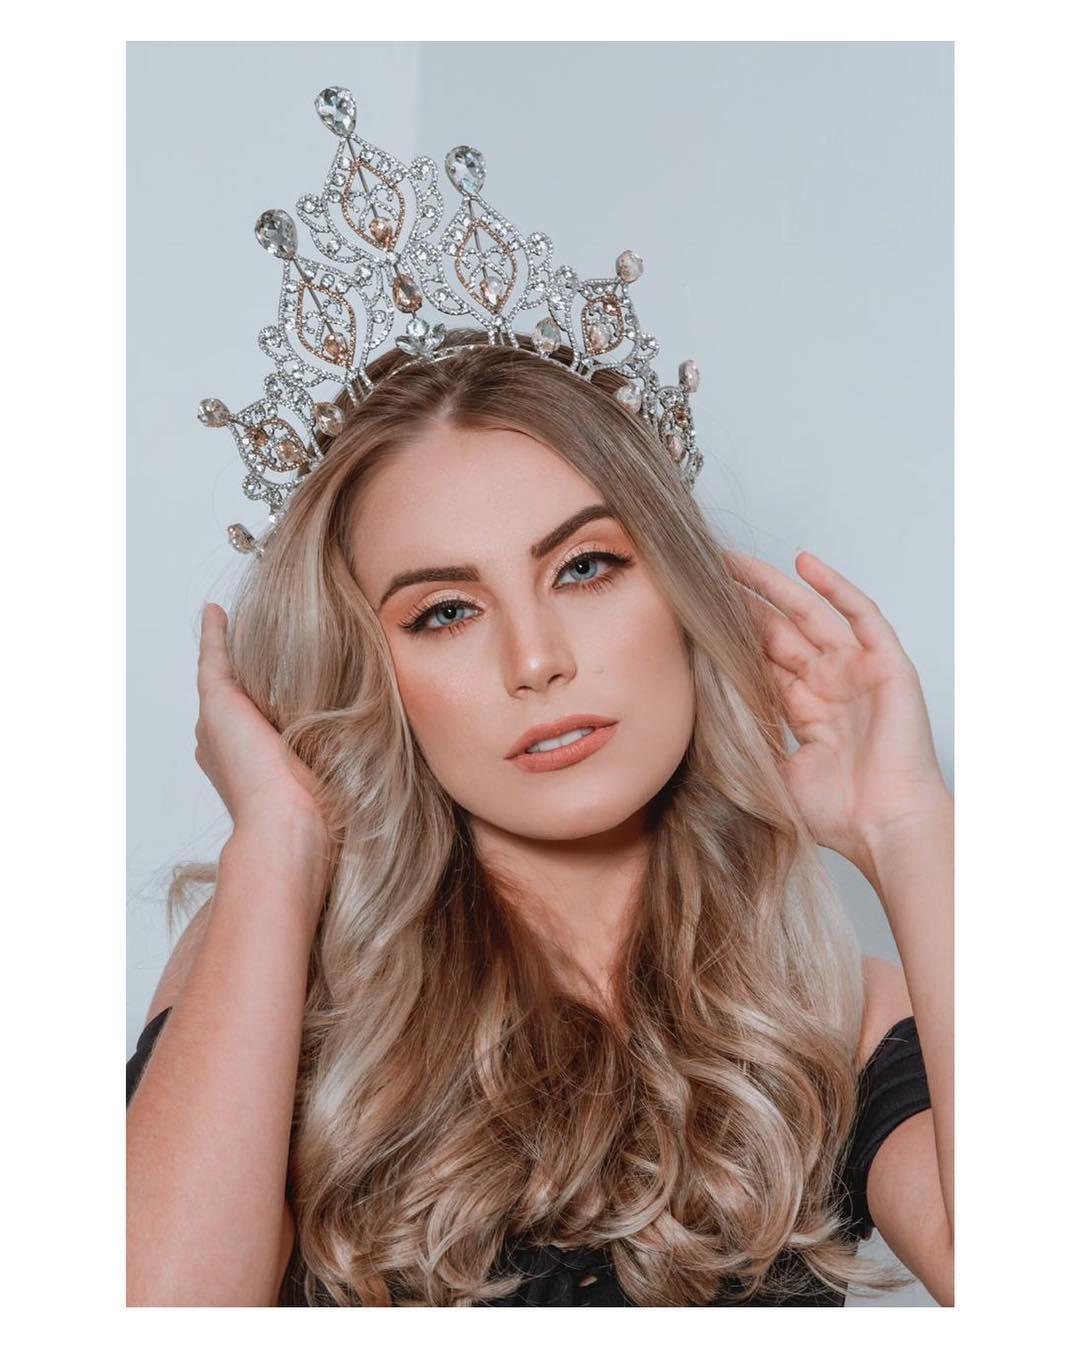 amanda pegoraro , miss brasil de las americas 2019. 55883510